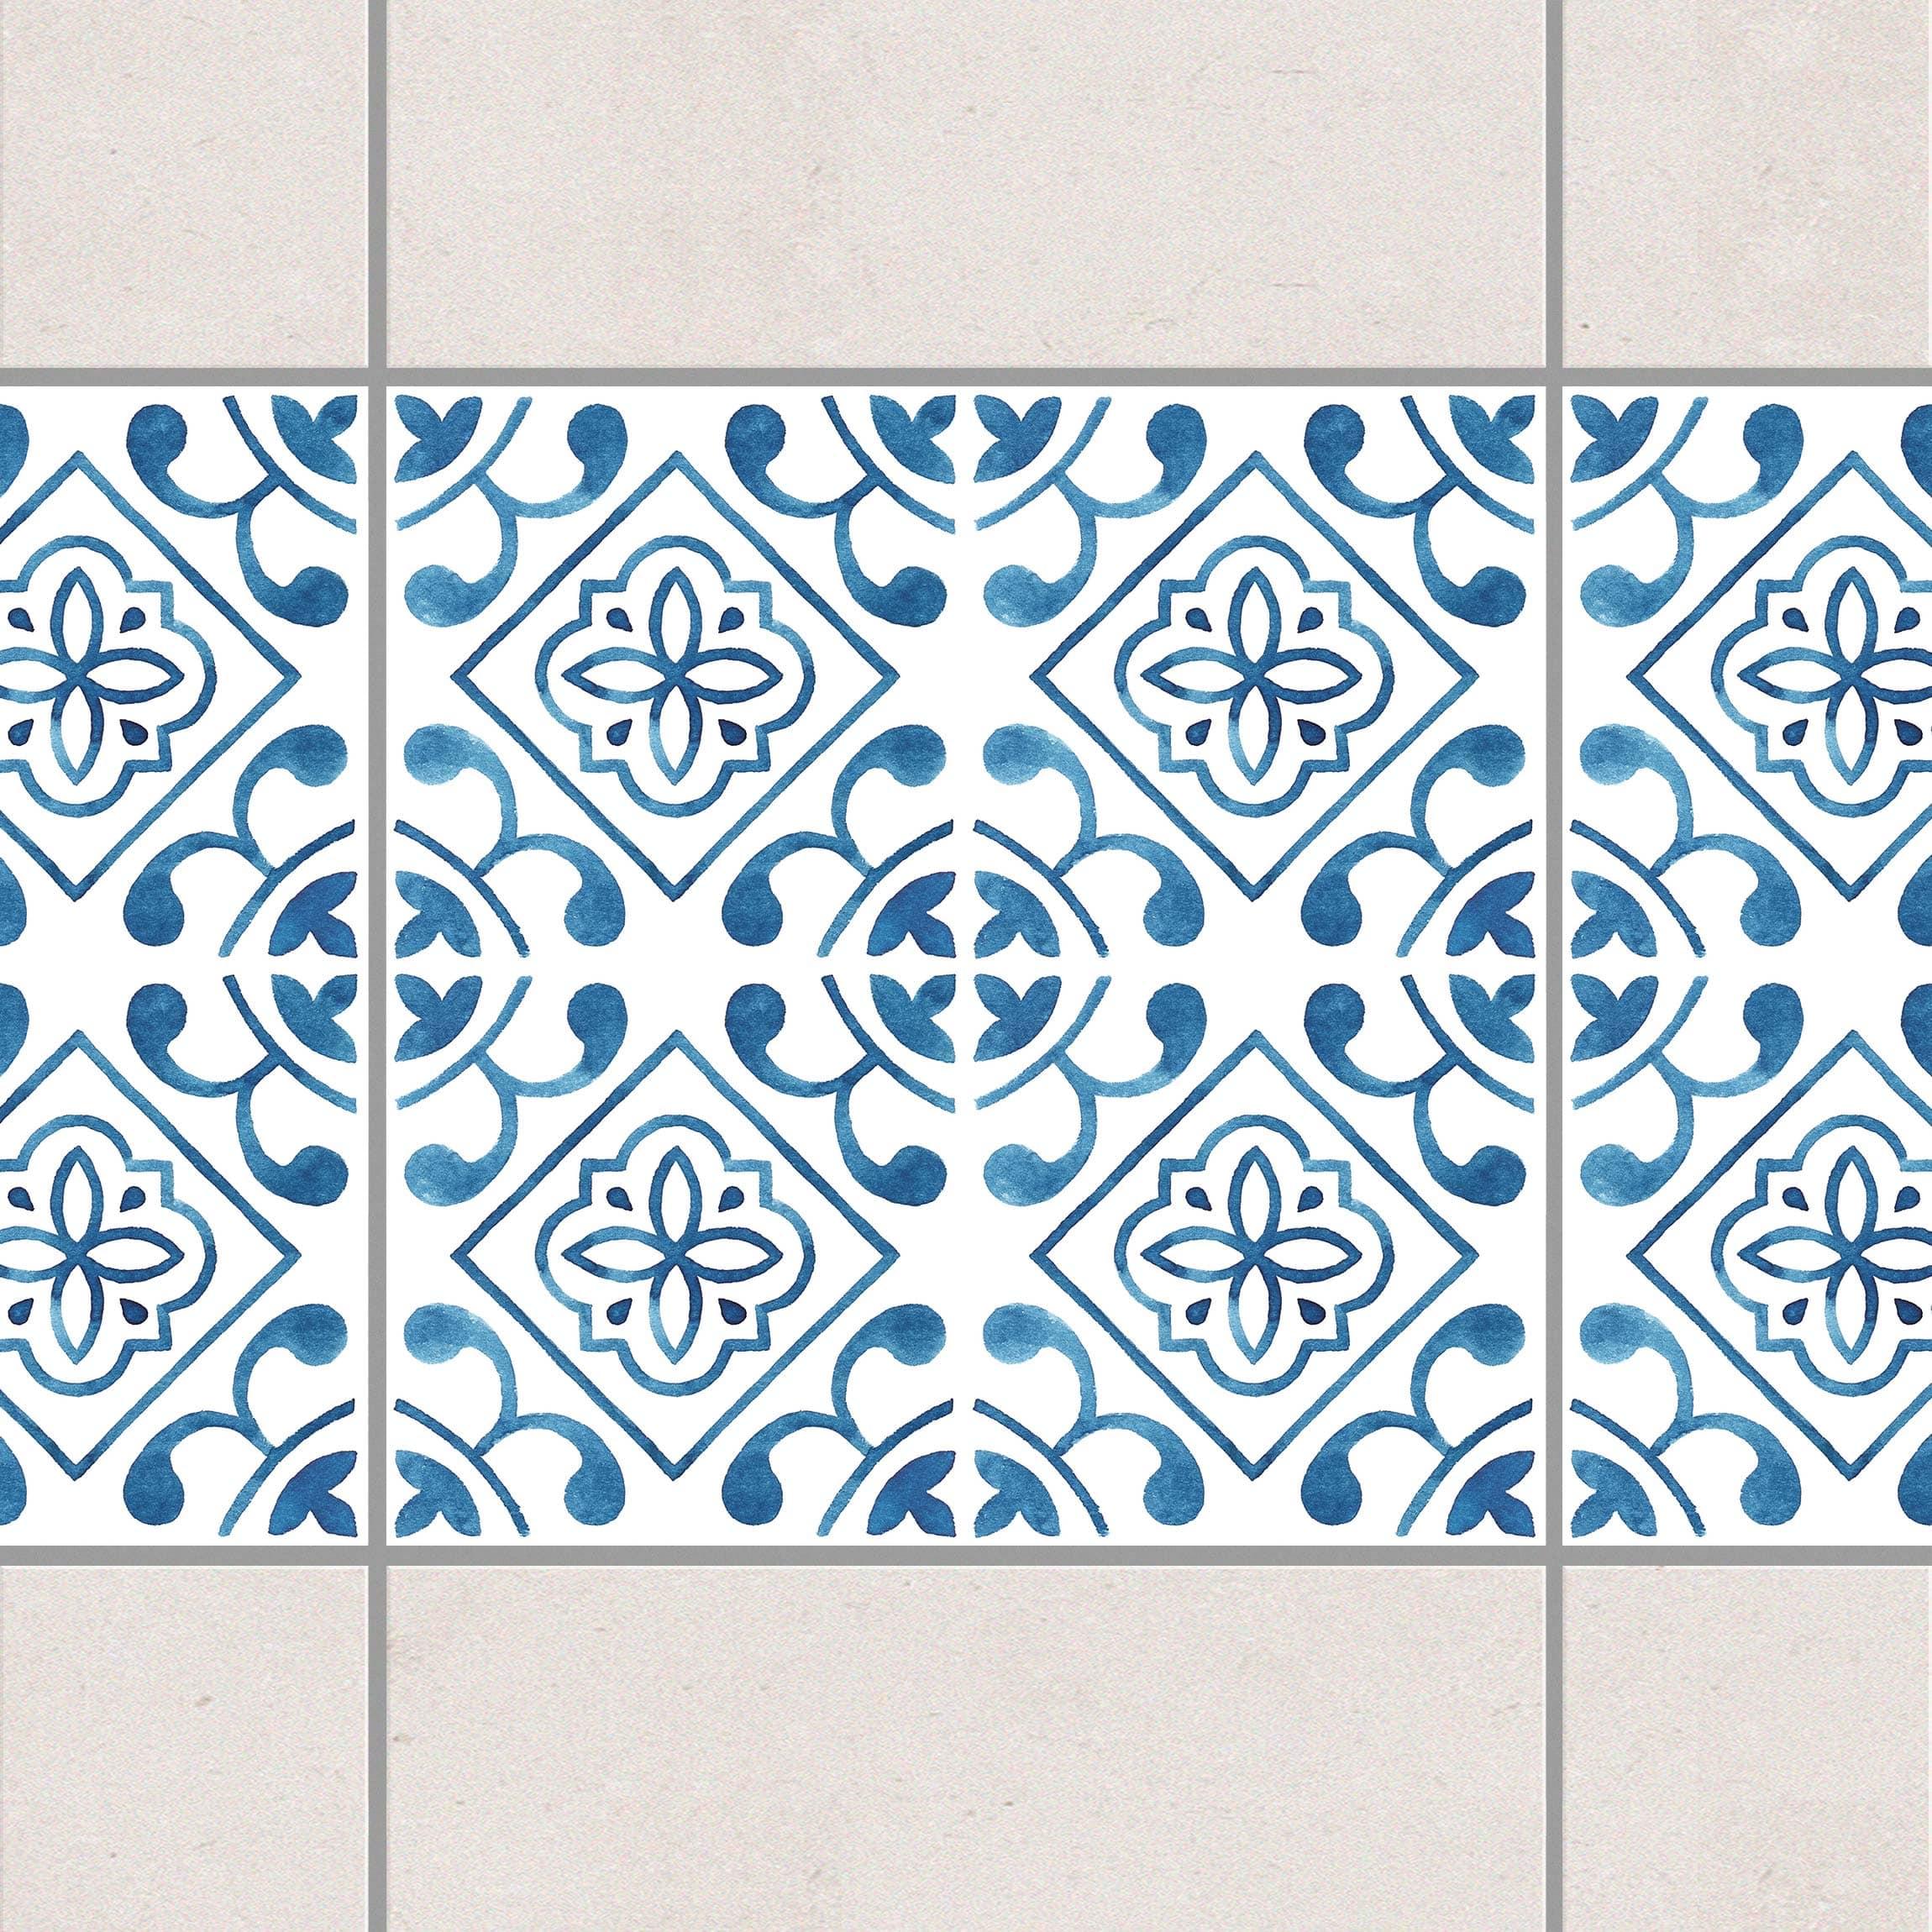 fliesen bord re blau wei muster serie no 2 1 1 quadrat 20cm x 20cm fliesenaufkleber. Black Bedroom Furniture Sets. Home Design Ideas